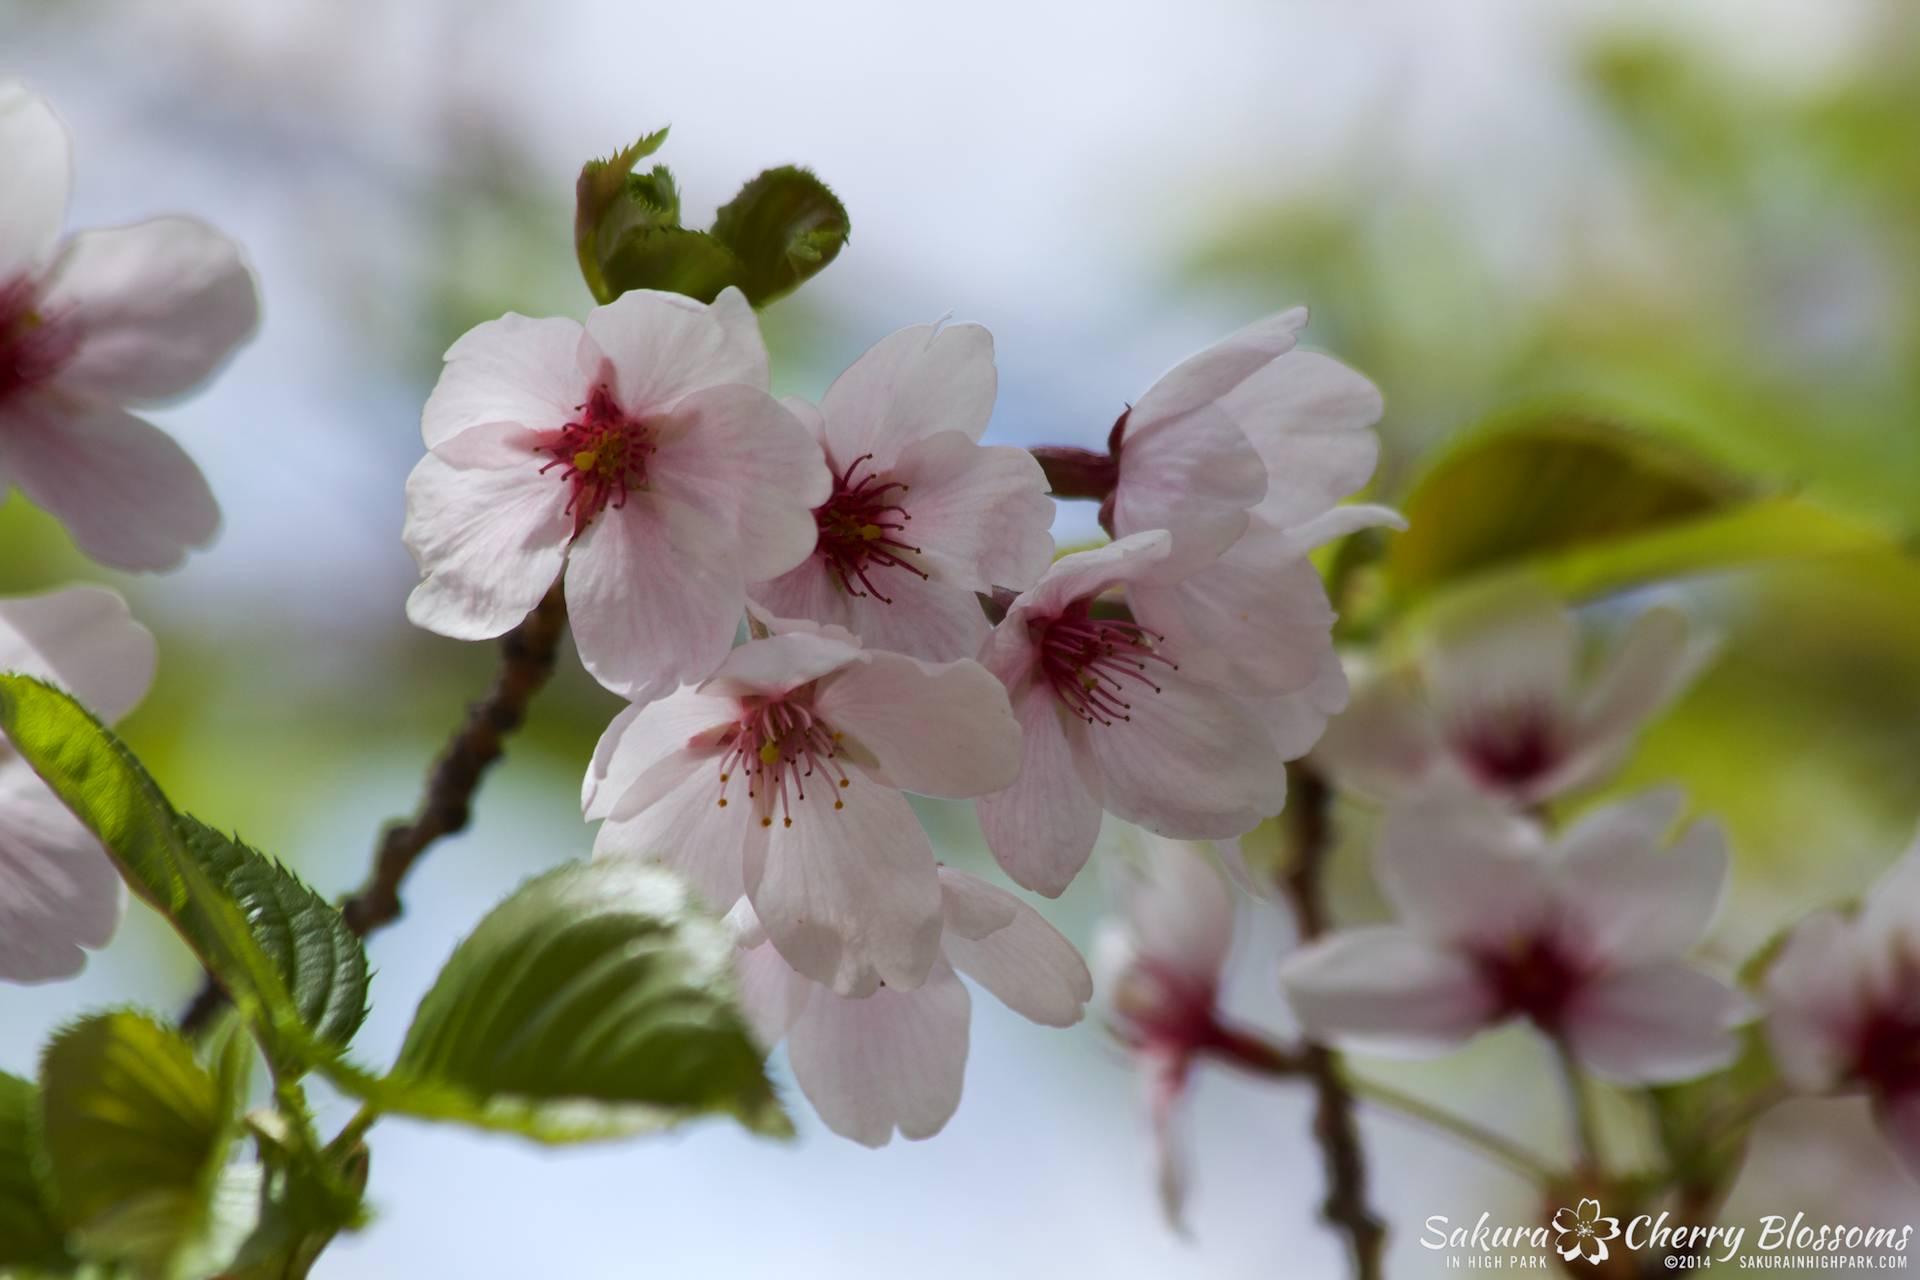 SakuraInHighPark-May1614-547.jpg